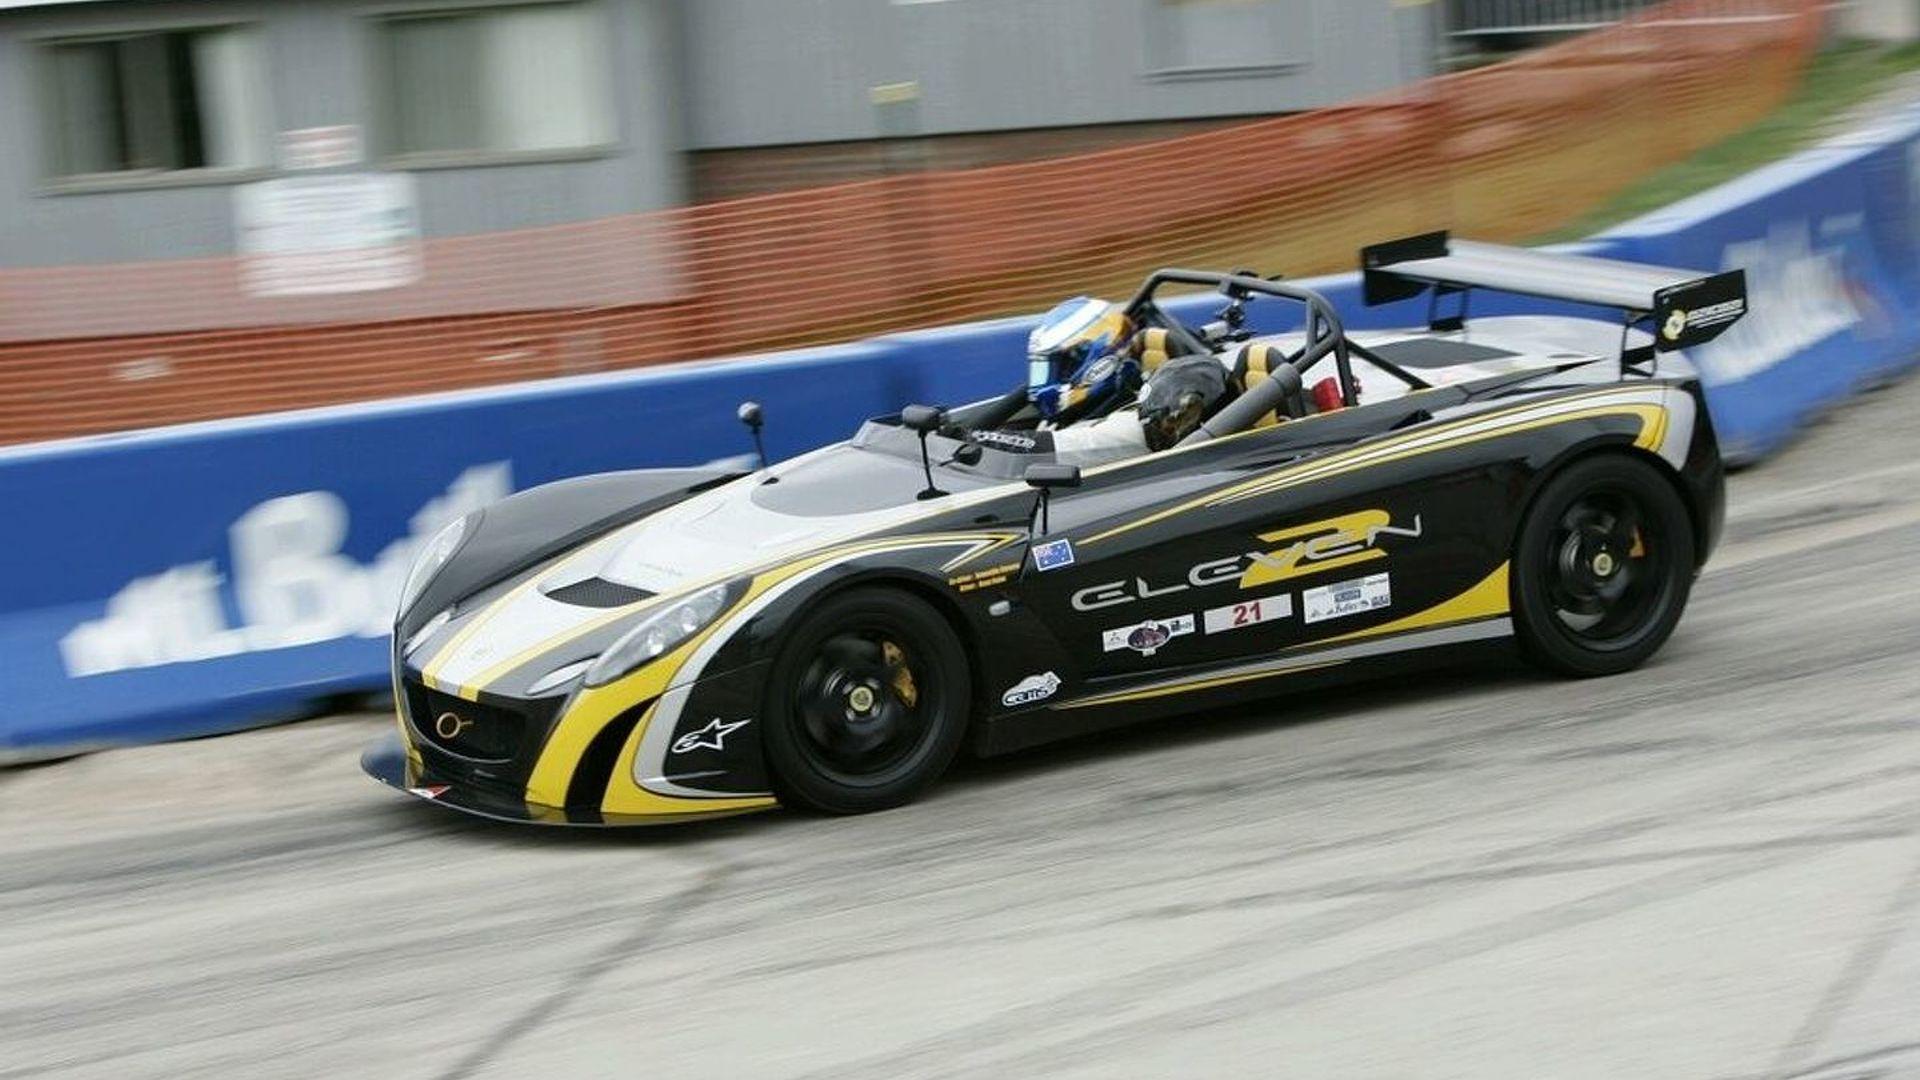 https://icdn-7.motor1.com/images/mgl/x9oP/s1/2007-27613-lotus-2-eleven-at-mt-buller-sprint1.jpg